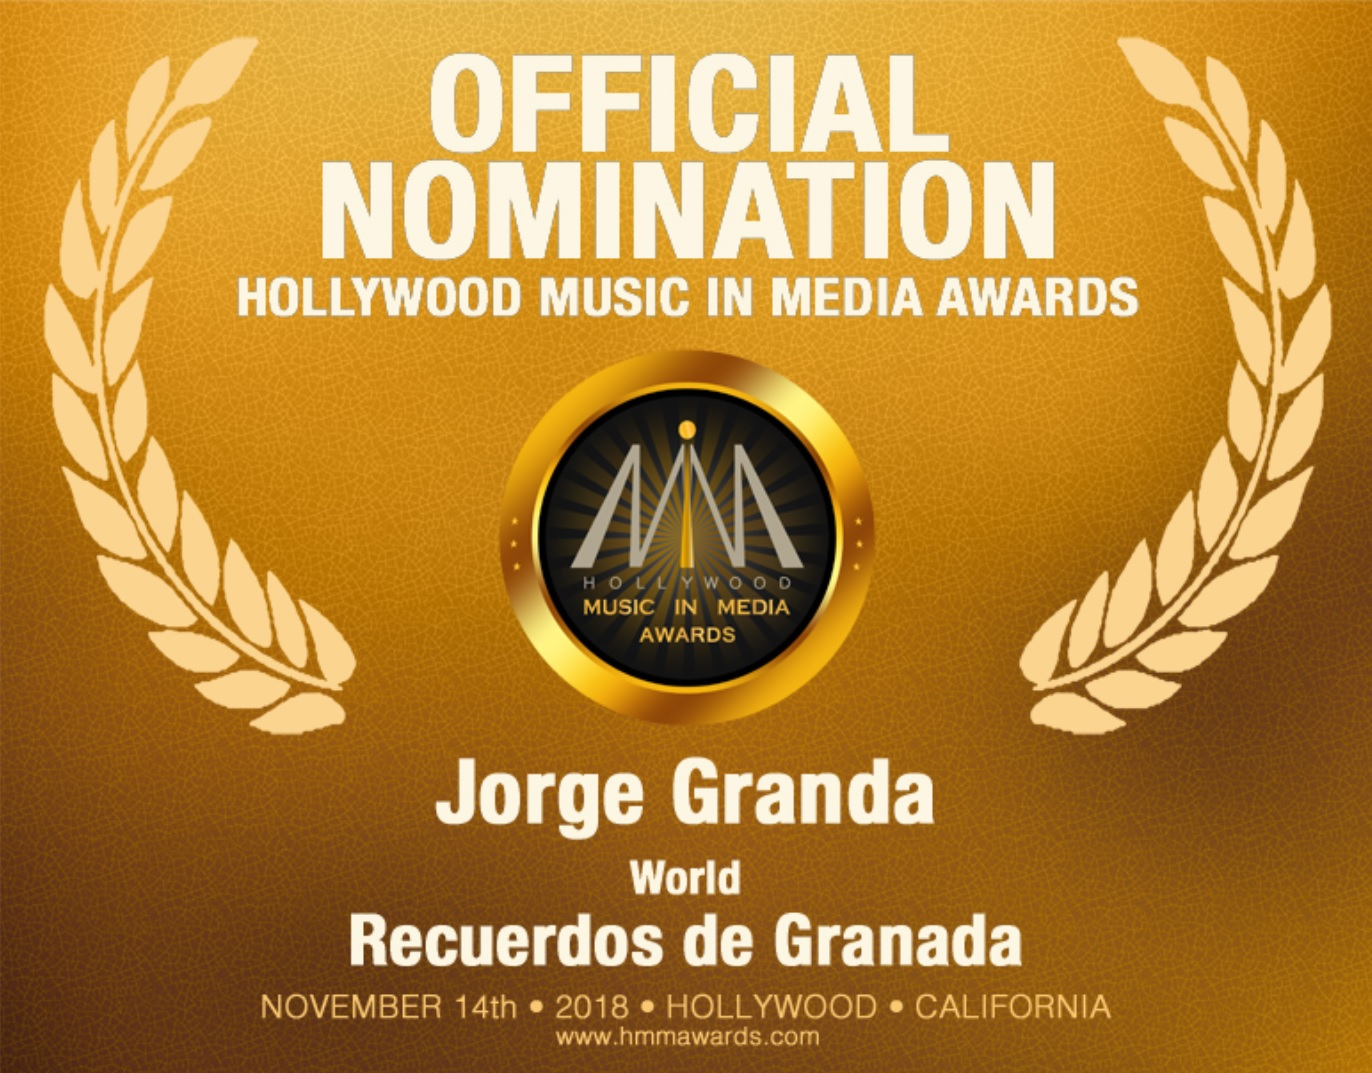 Jorge Granda Nominacion Oficial HMMA